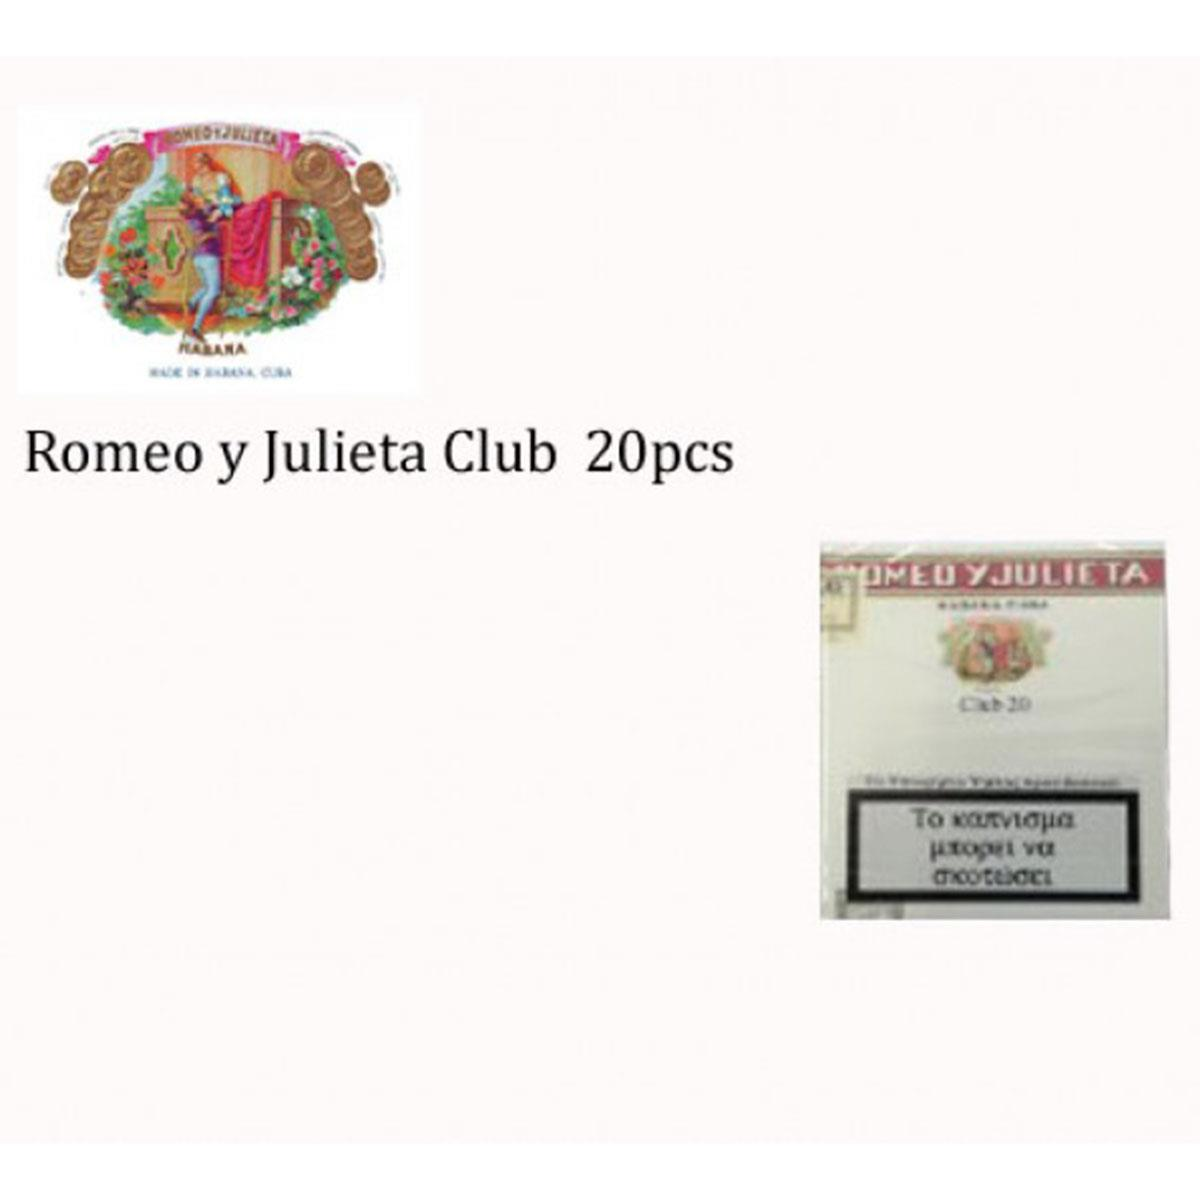 Romeo y Julieta Club 20